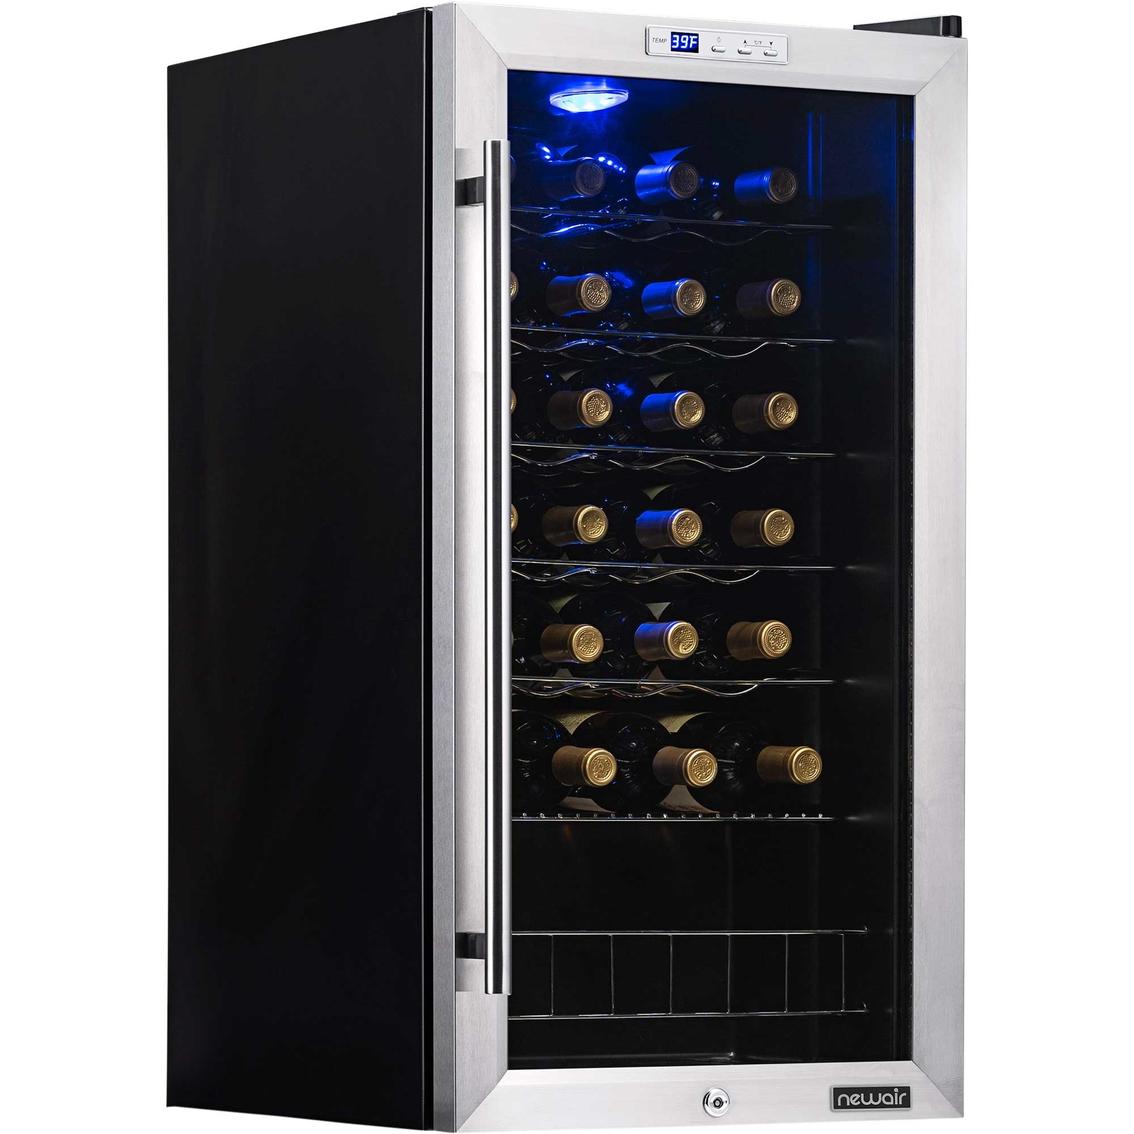 Newair Freestanding 27 Bottle Wine Cooler | Refrigerators | Furniture &  Appliances | Shop The Exchange